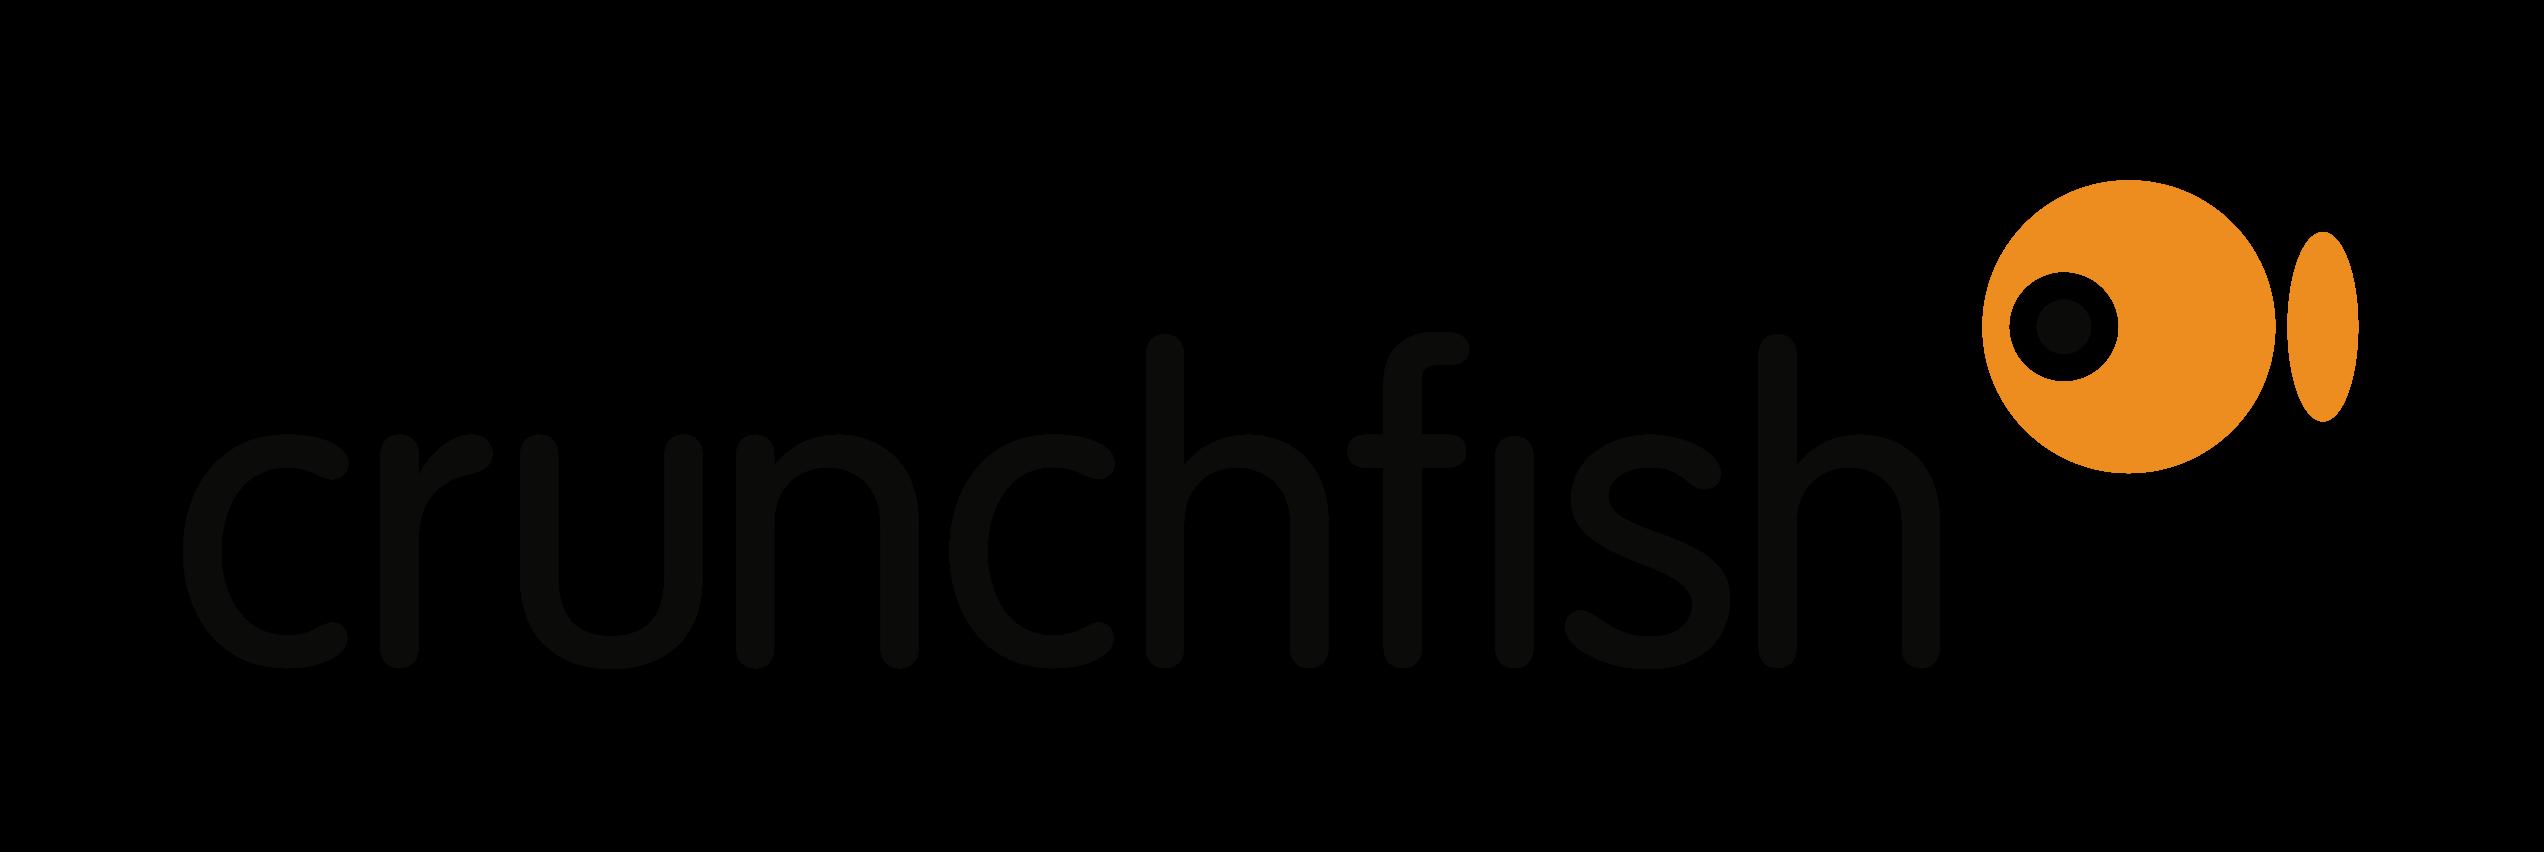 Crunchfish